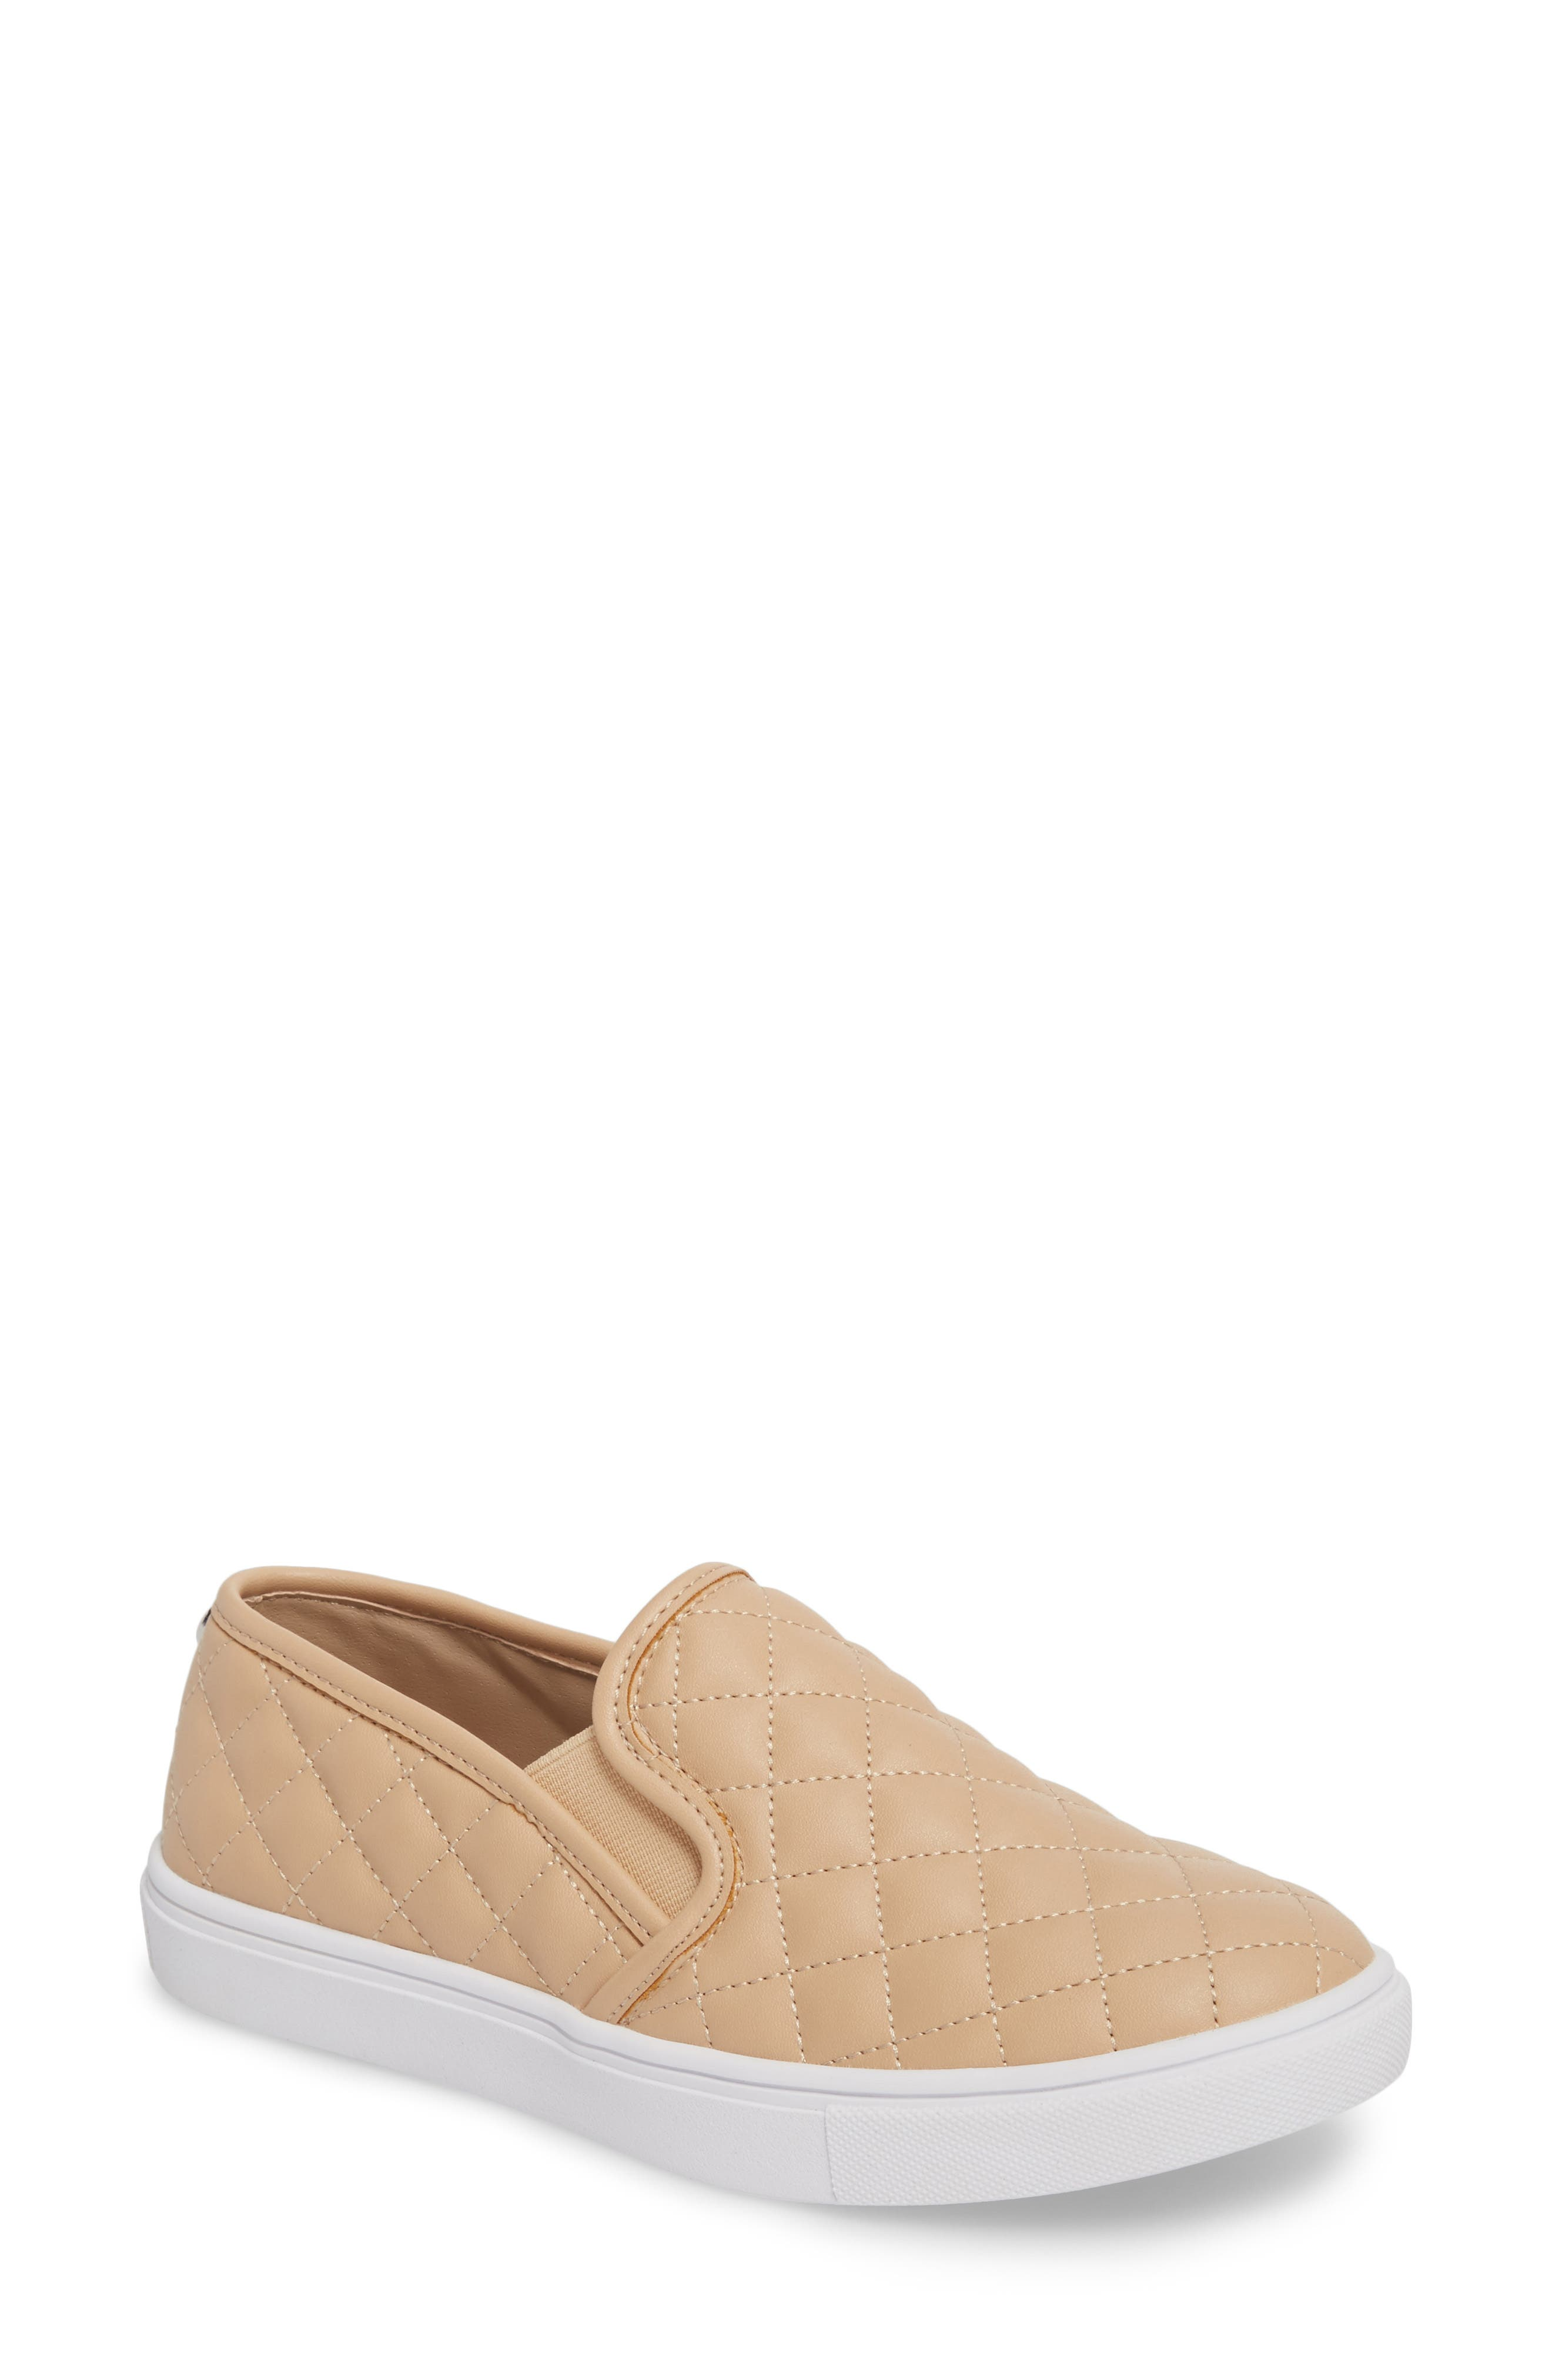 STEVE MADDEN, Ecentrcq Sneaker, Main thumbnail 1, color, 250